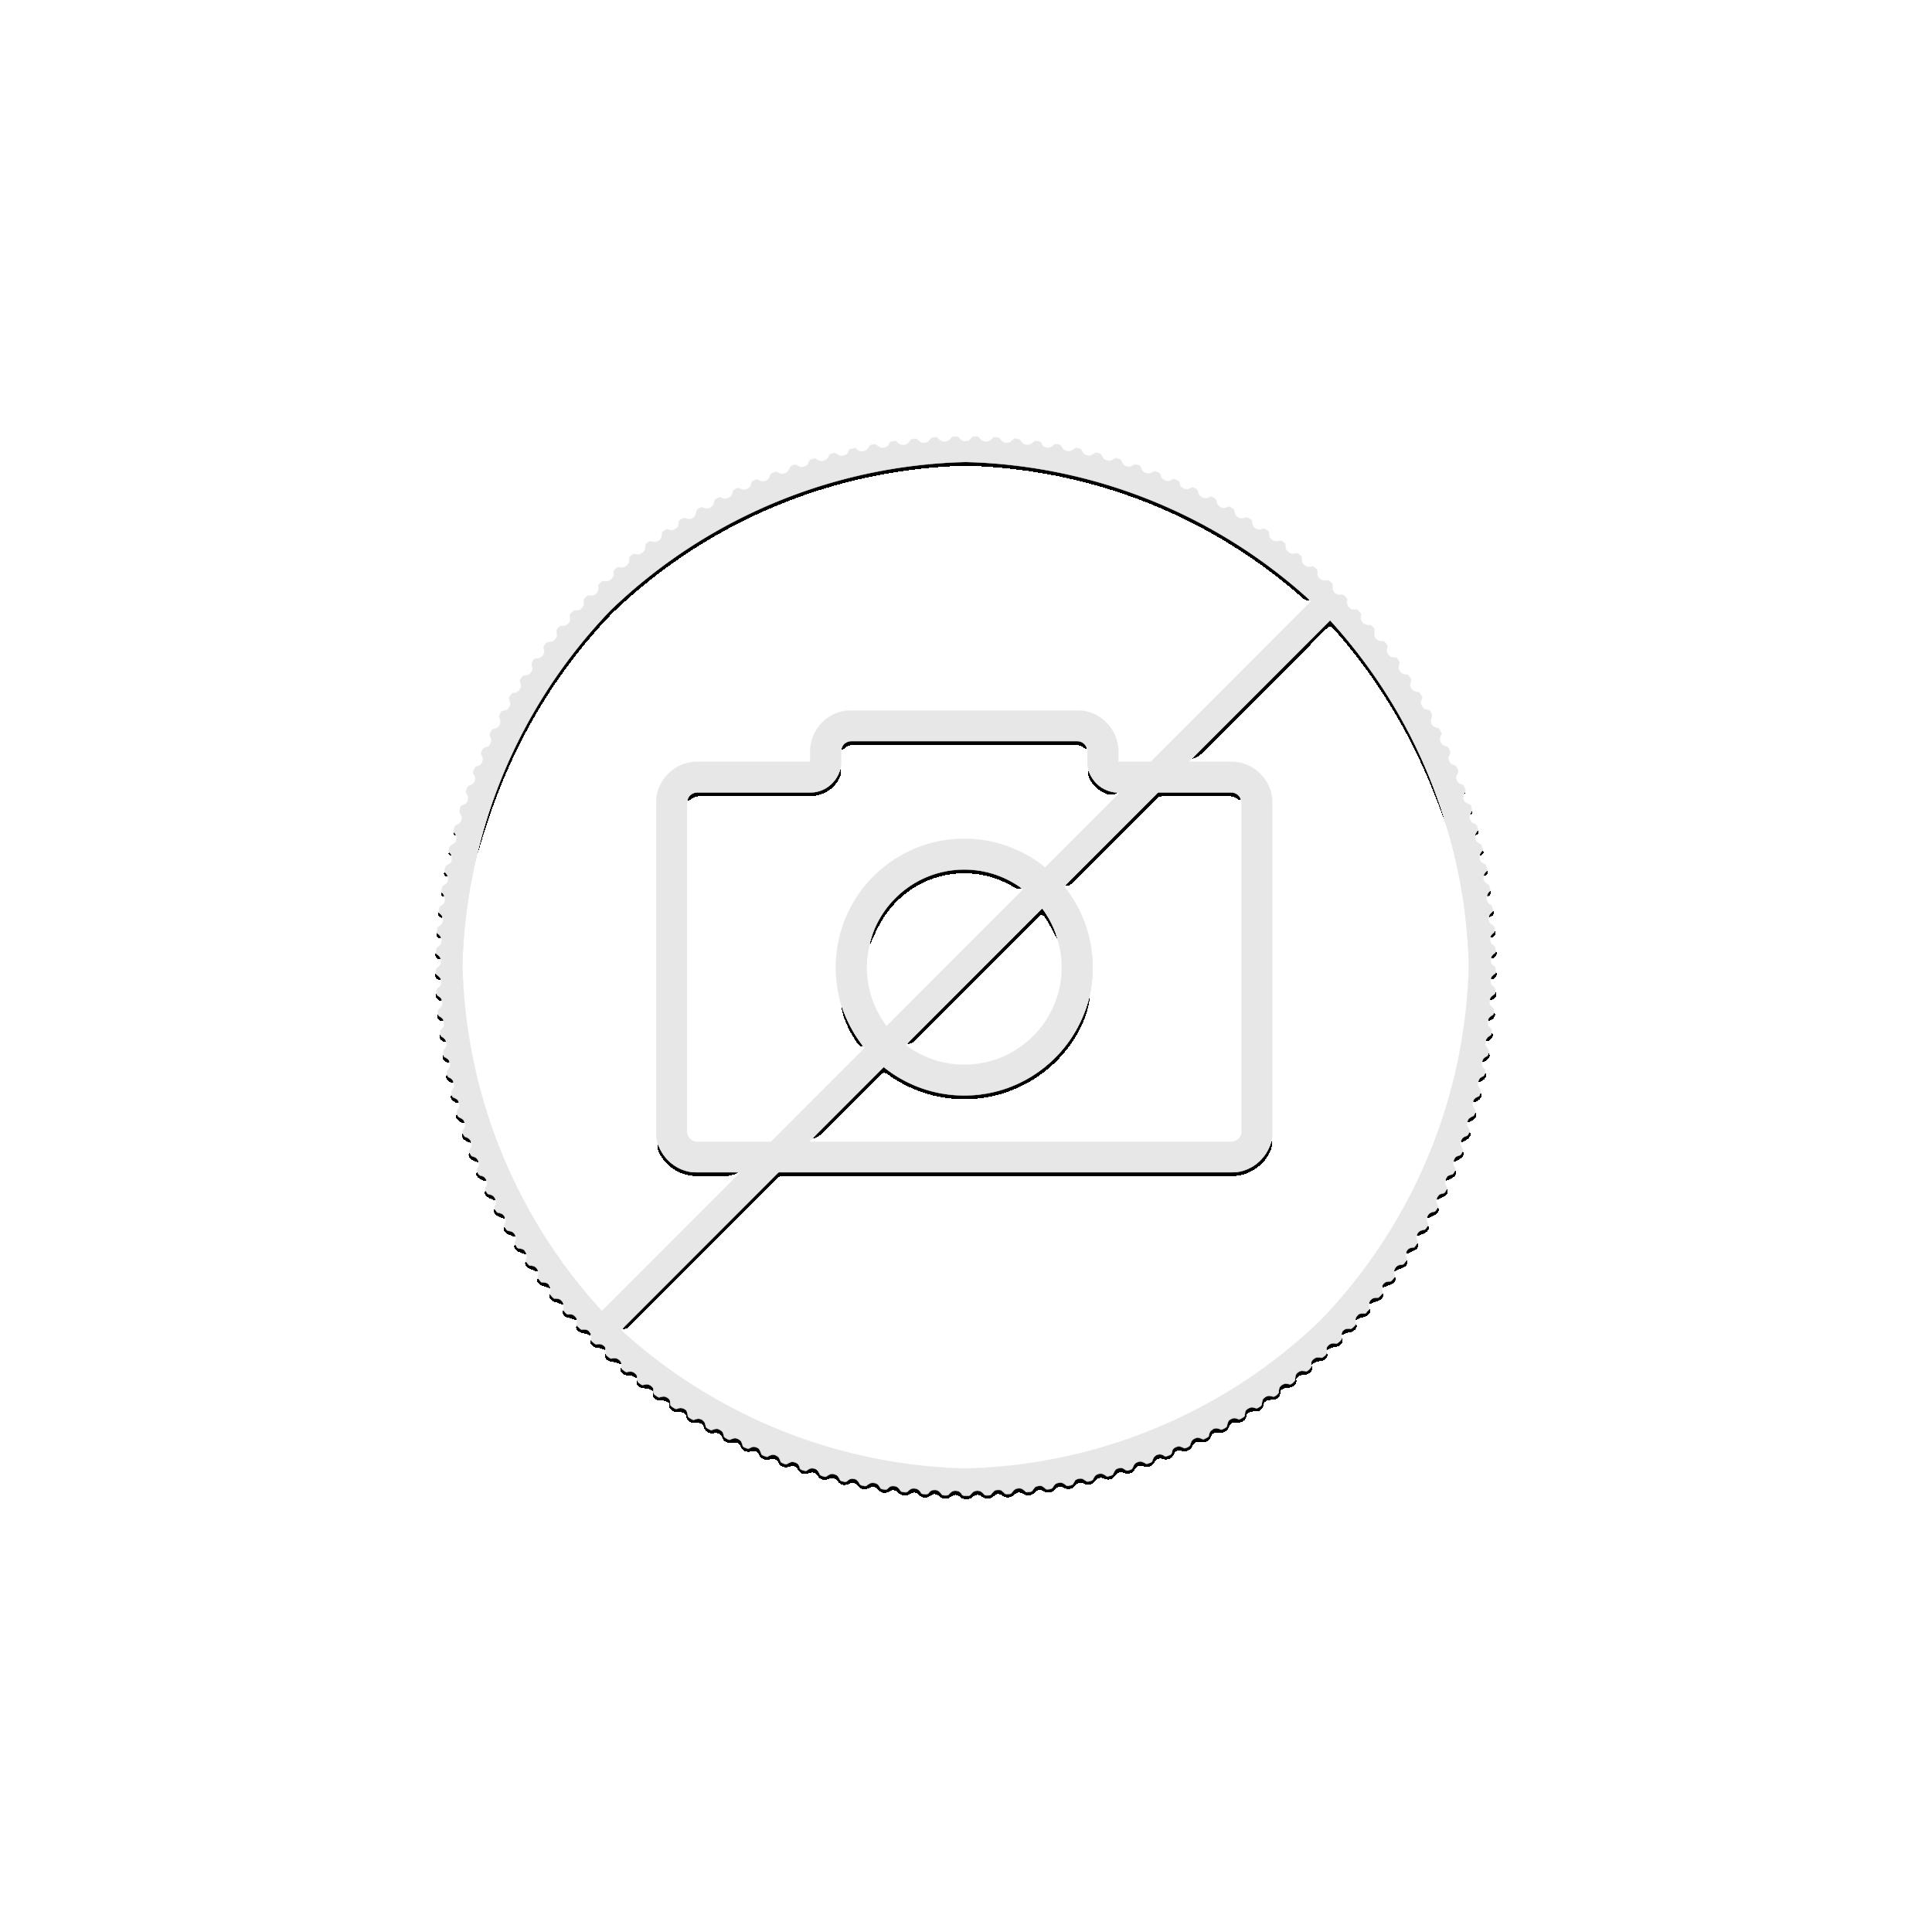 1 troy ounce gold Philharmonic 2020